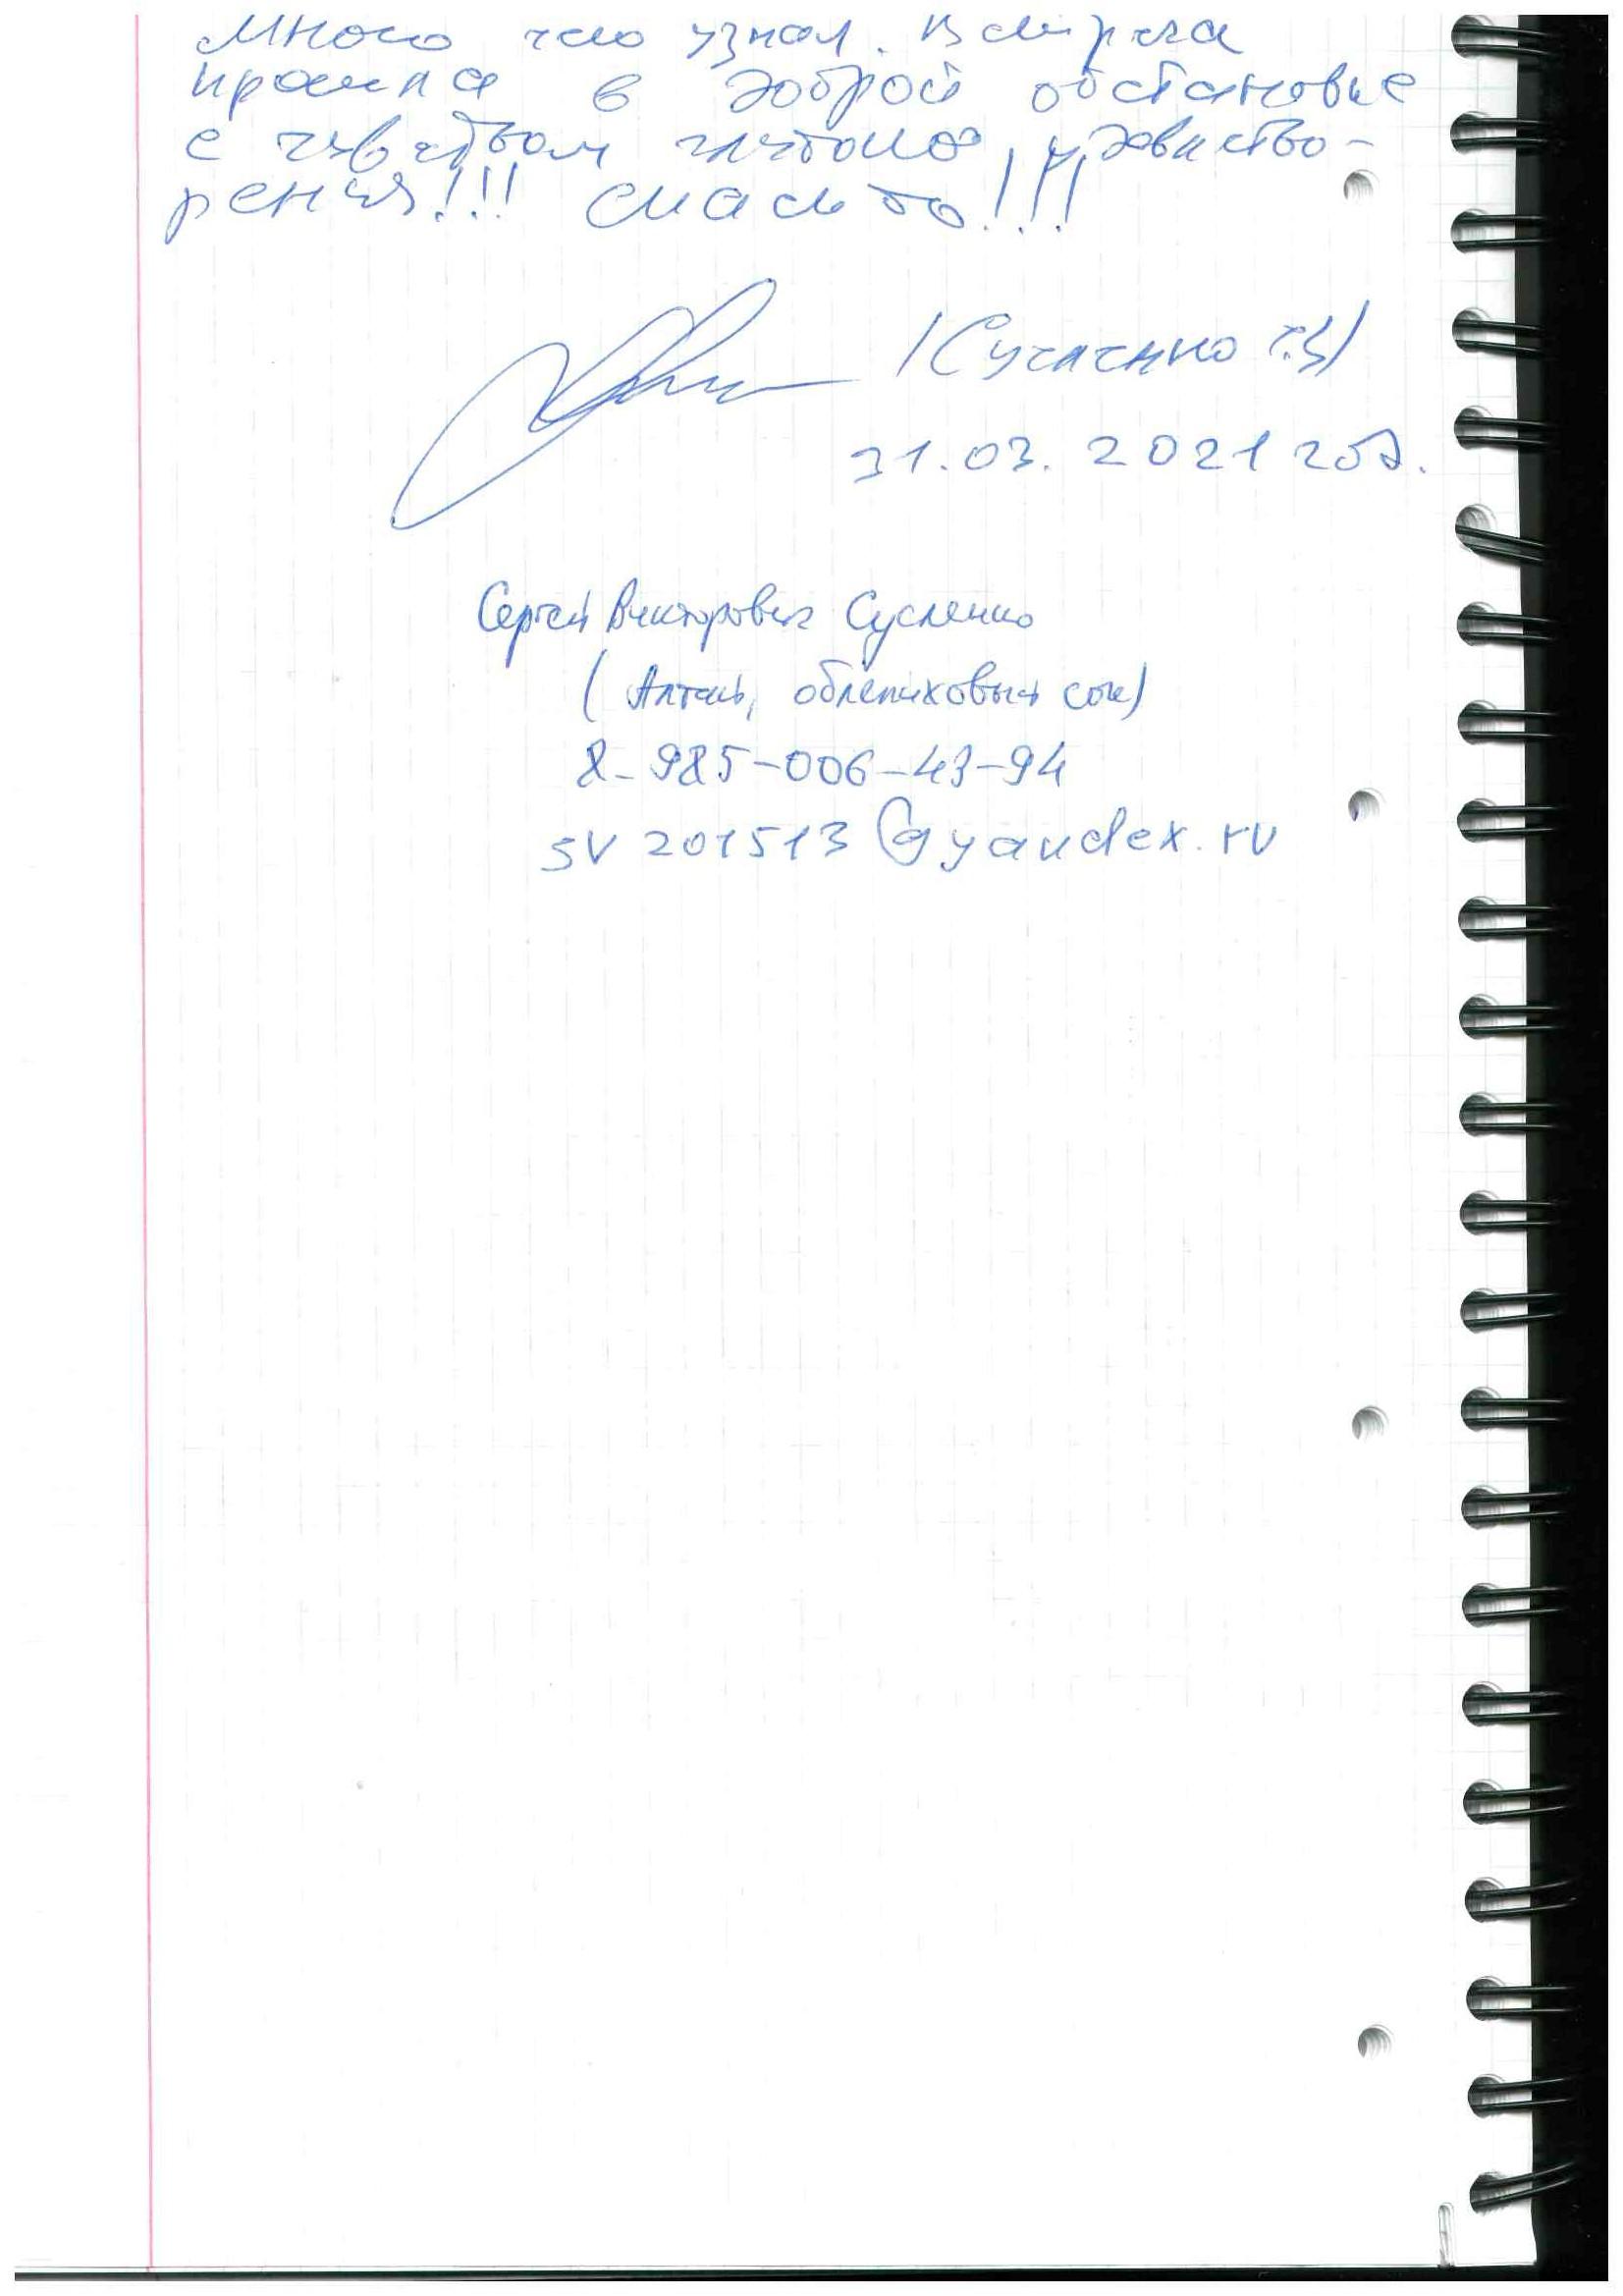 31.03.2021_2